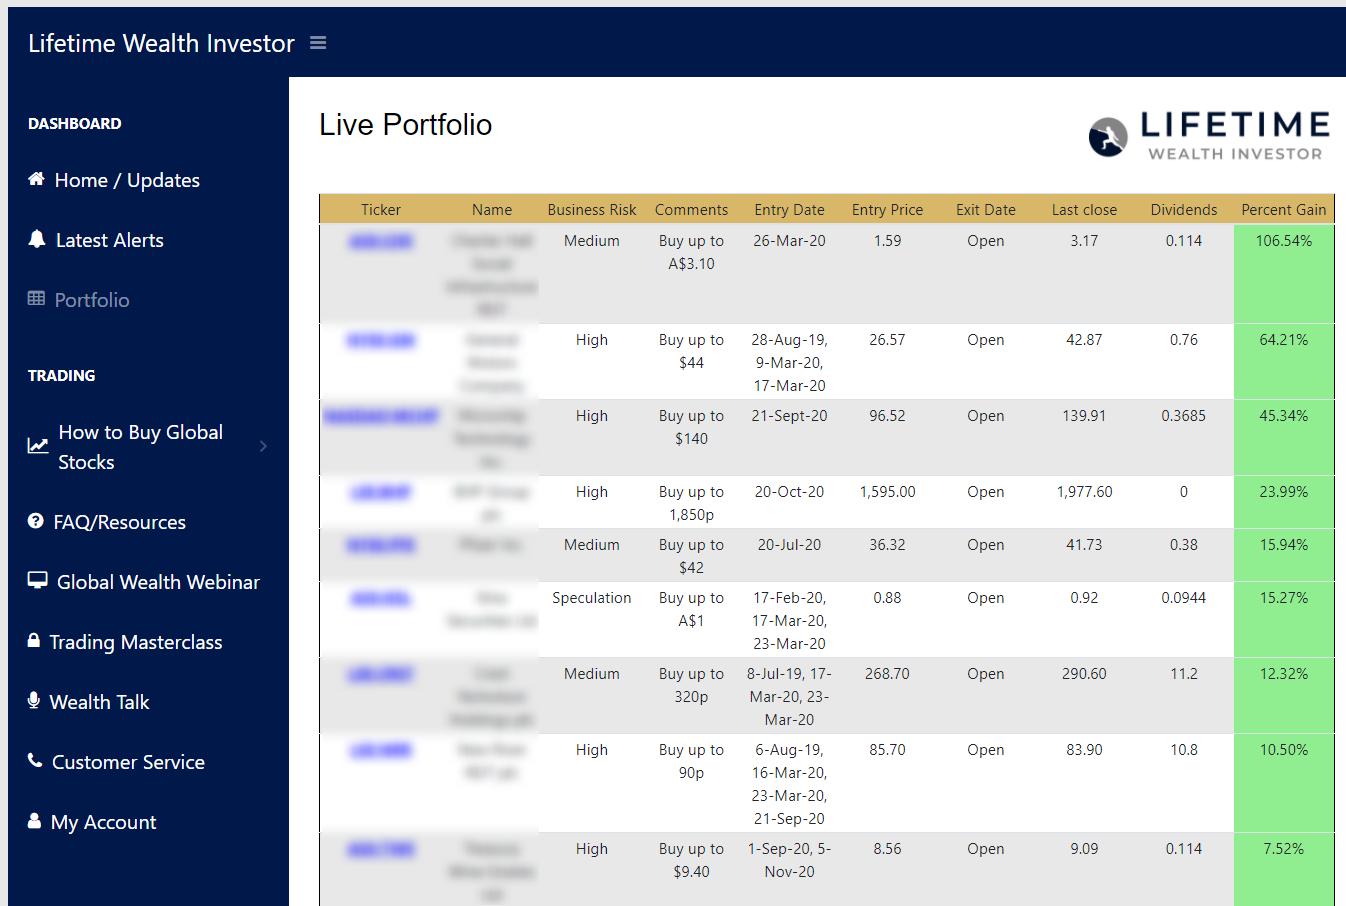 Lifetime Wealth Investor Portfolio Blurred